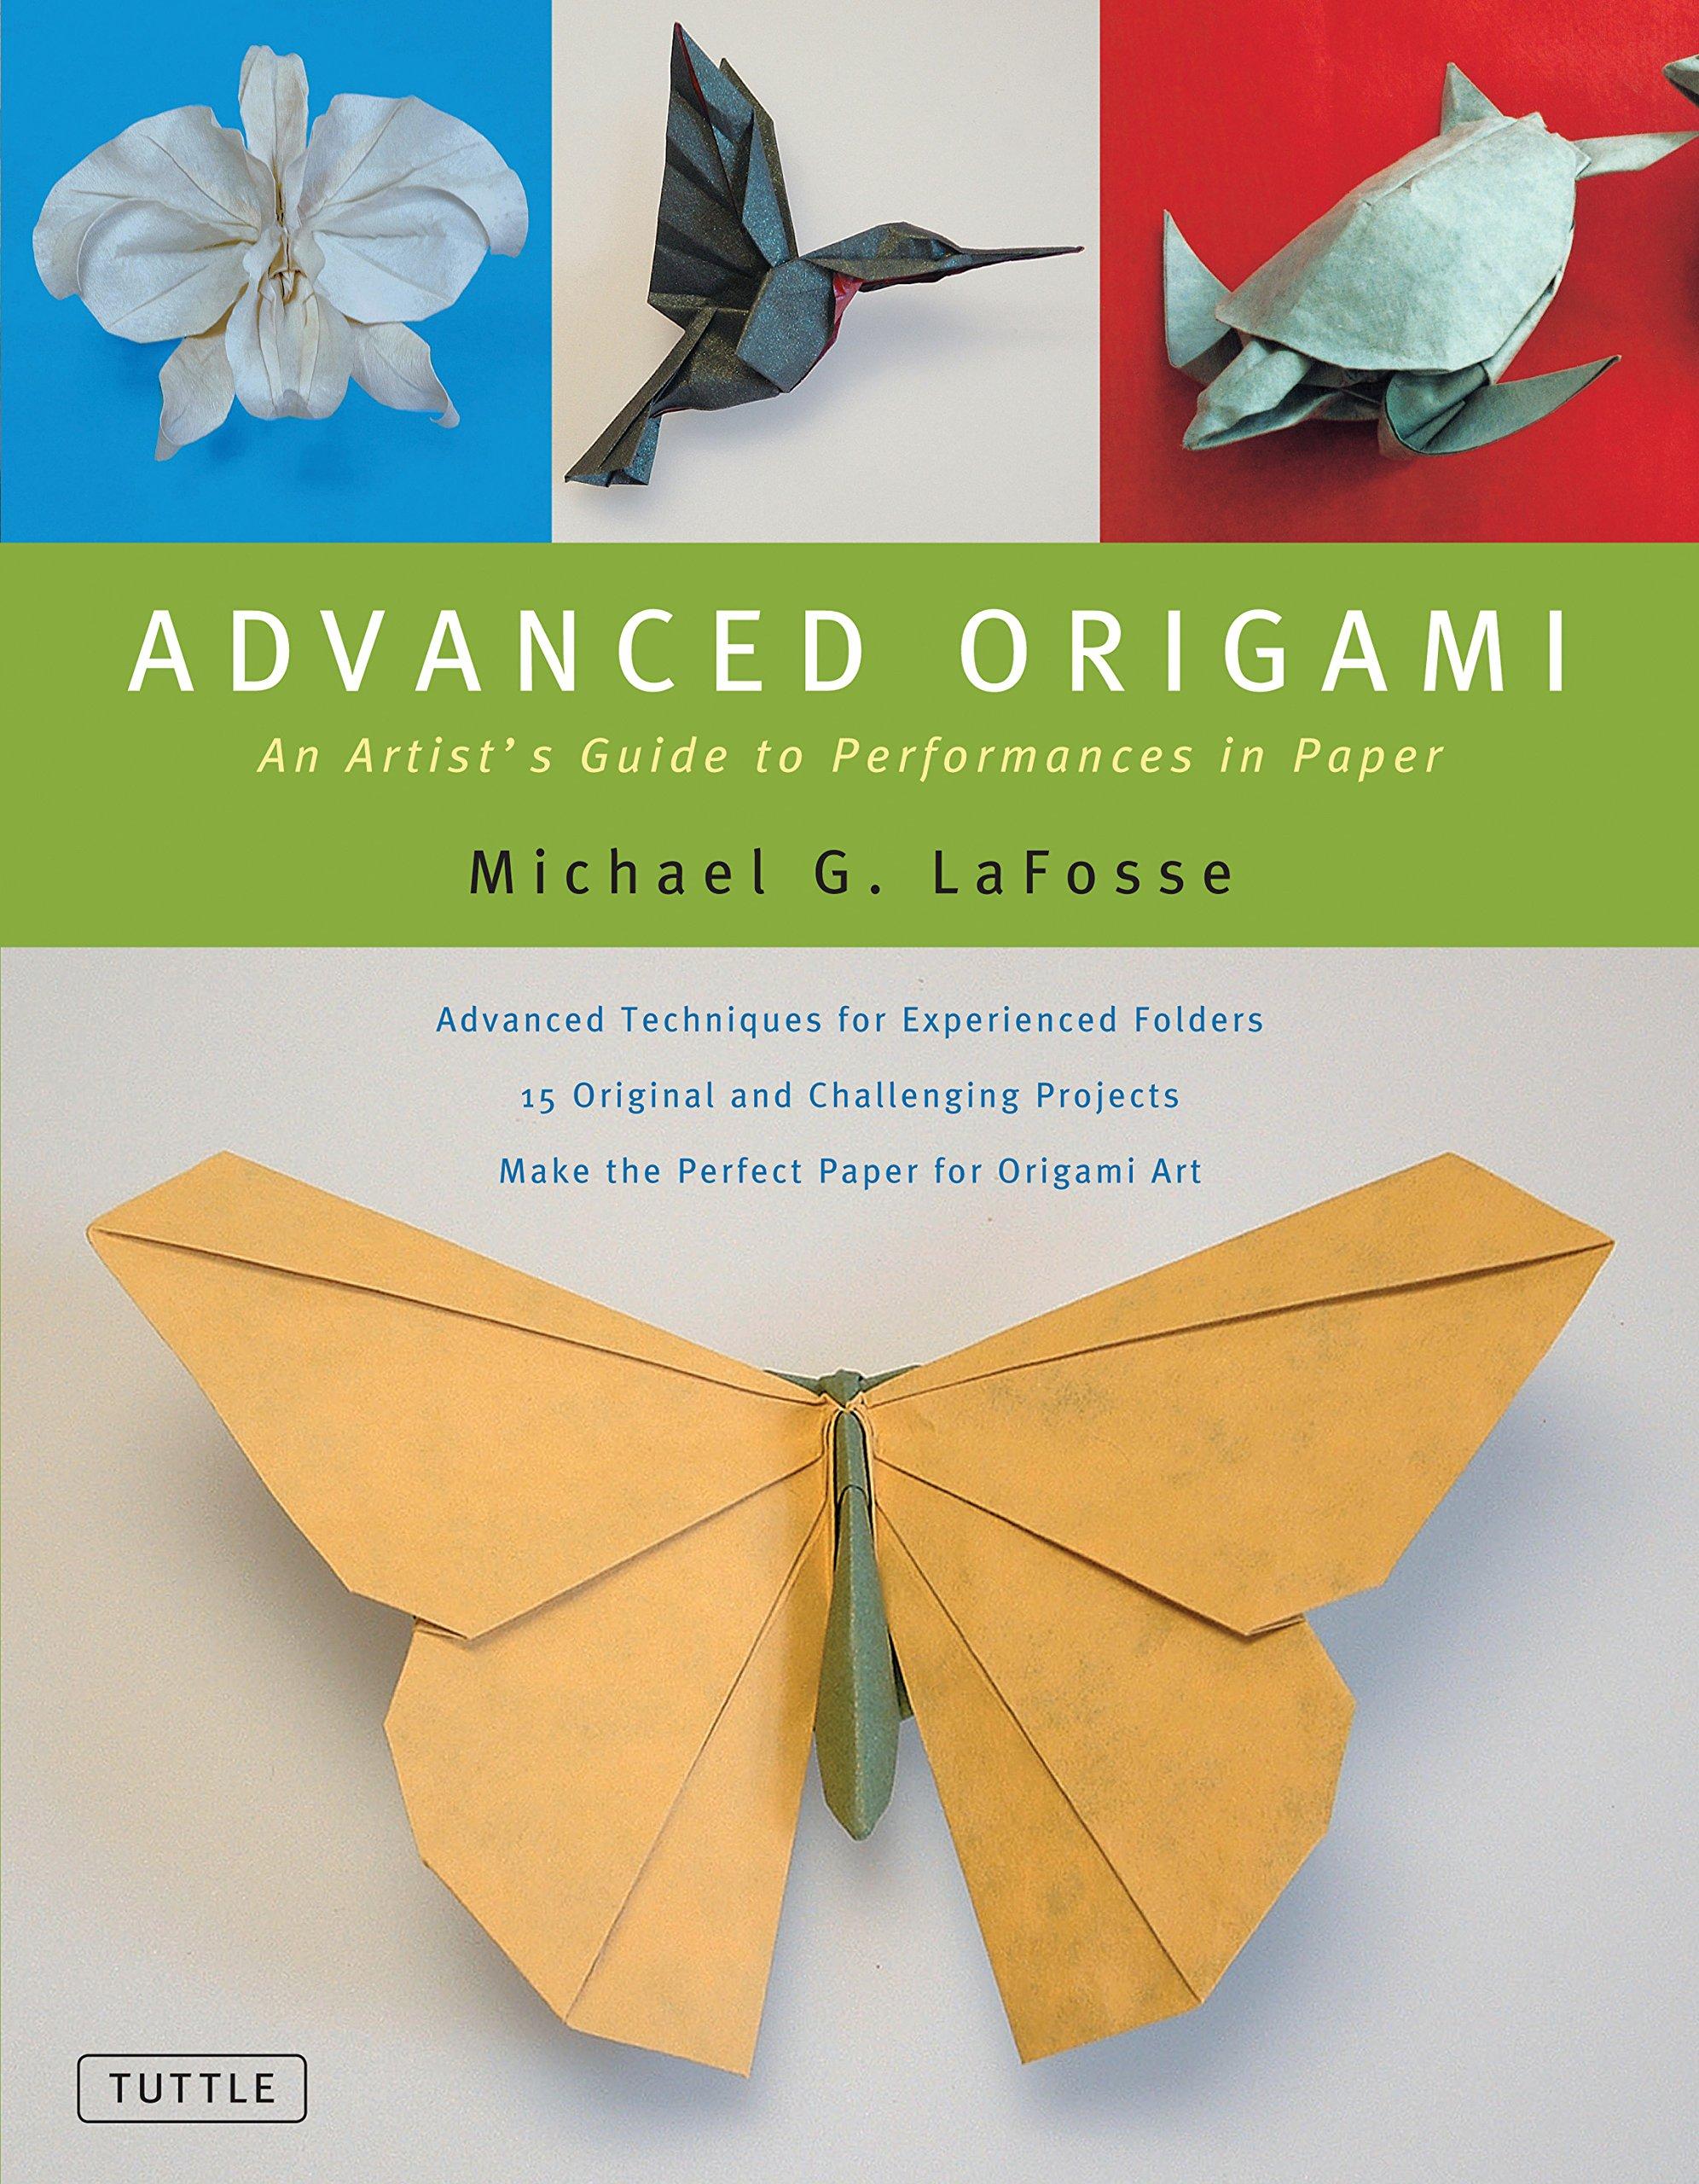 Origami: history, charts, tips 19